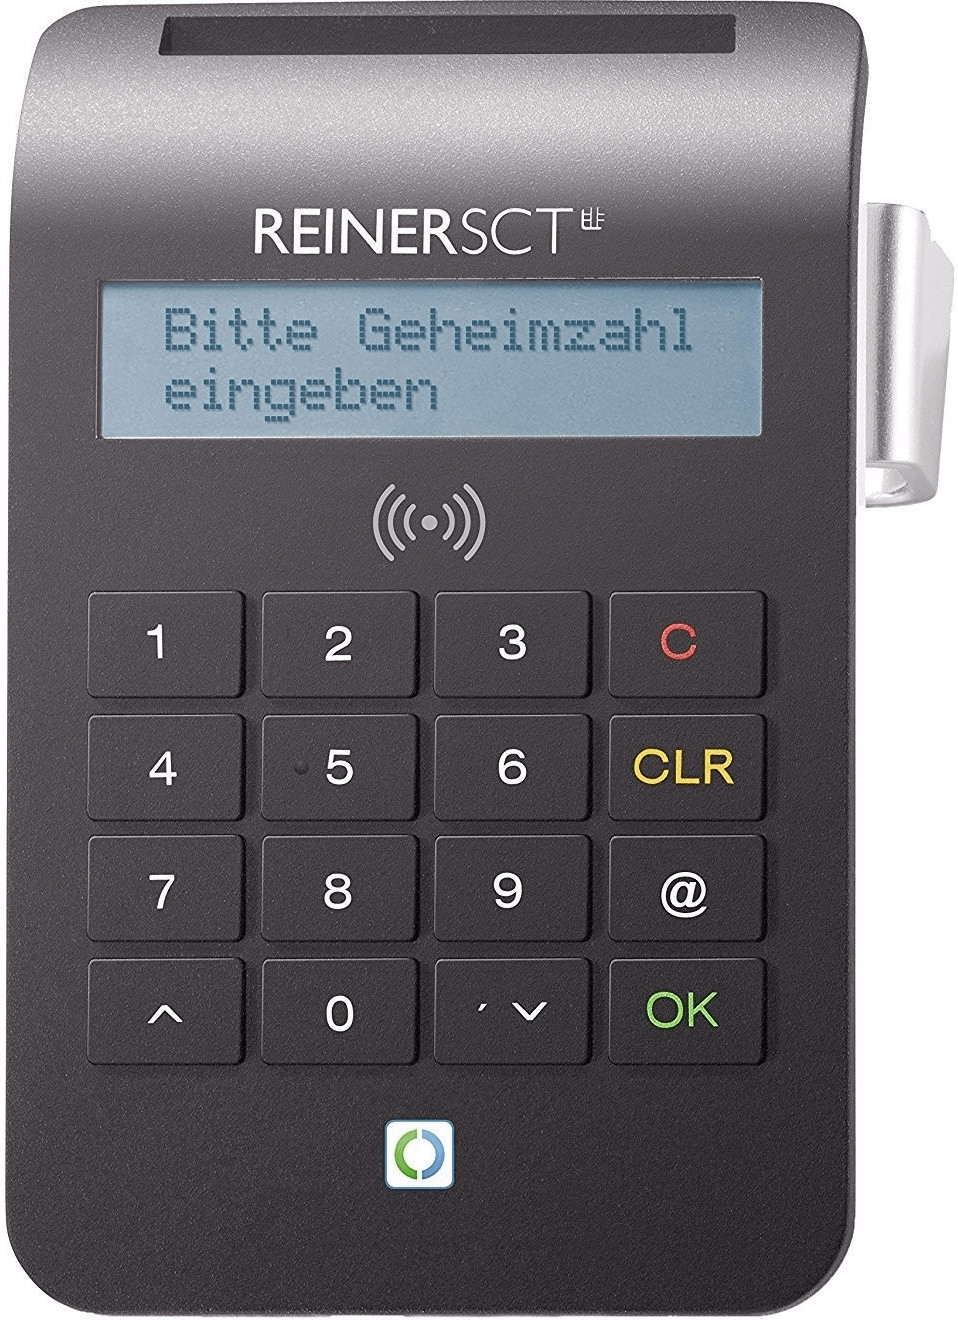 REINERSCT cyberJack RFID komfort